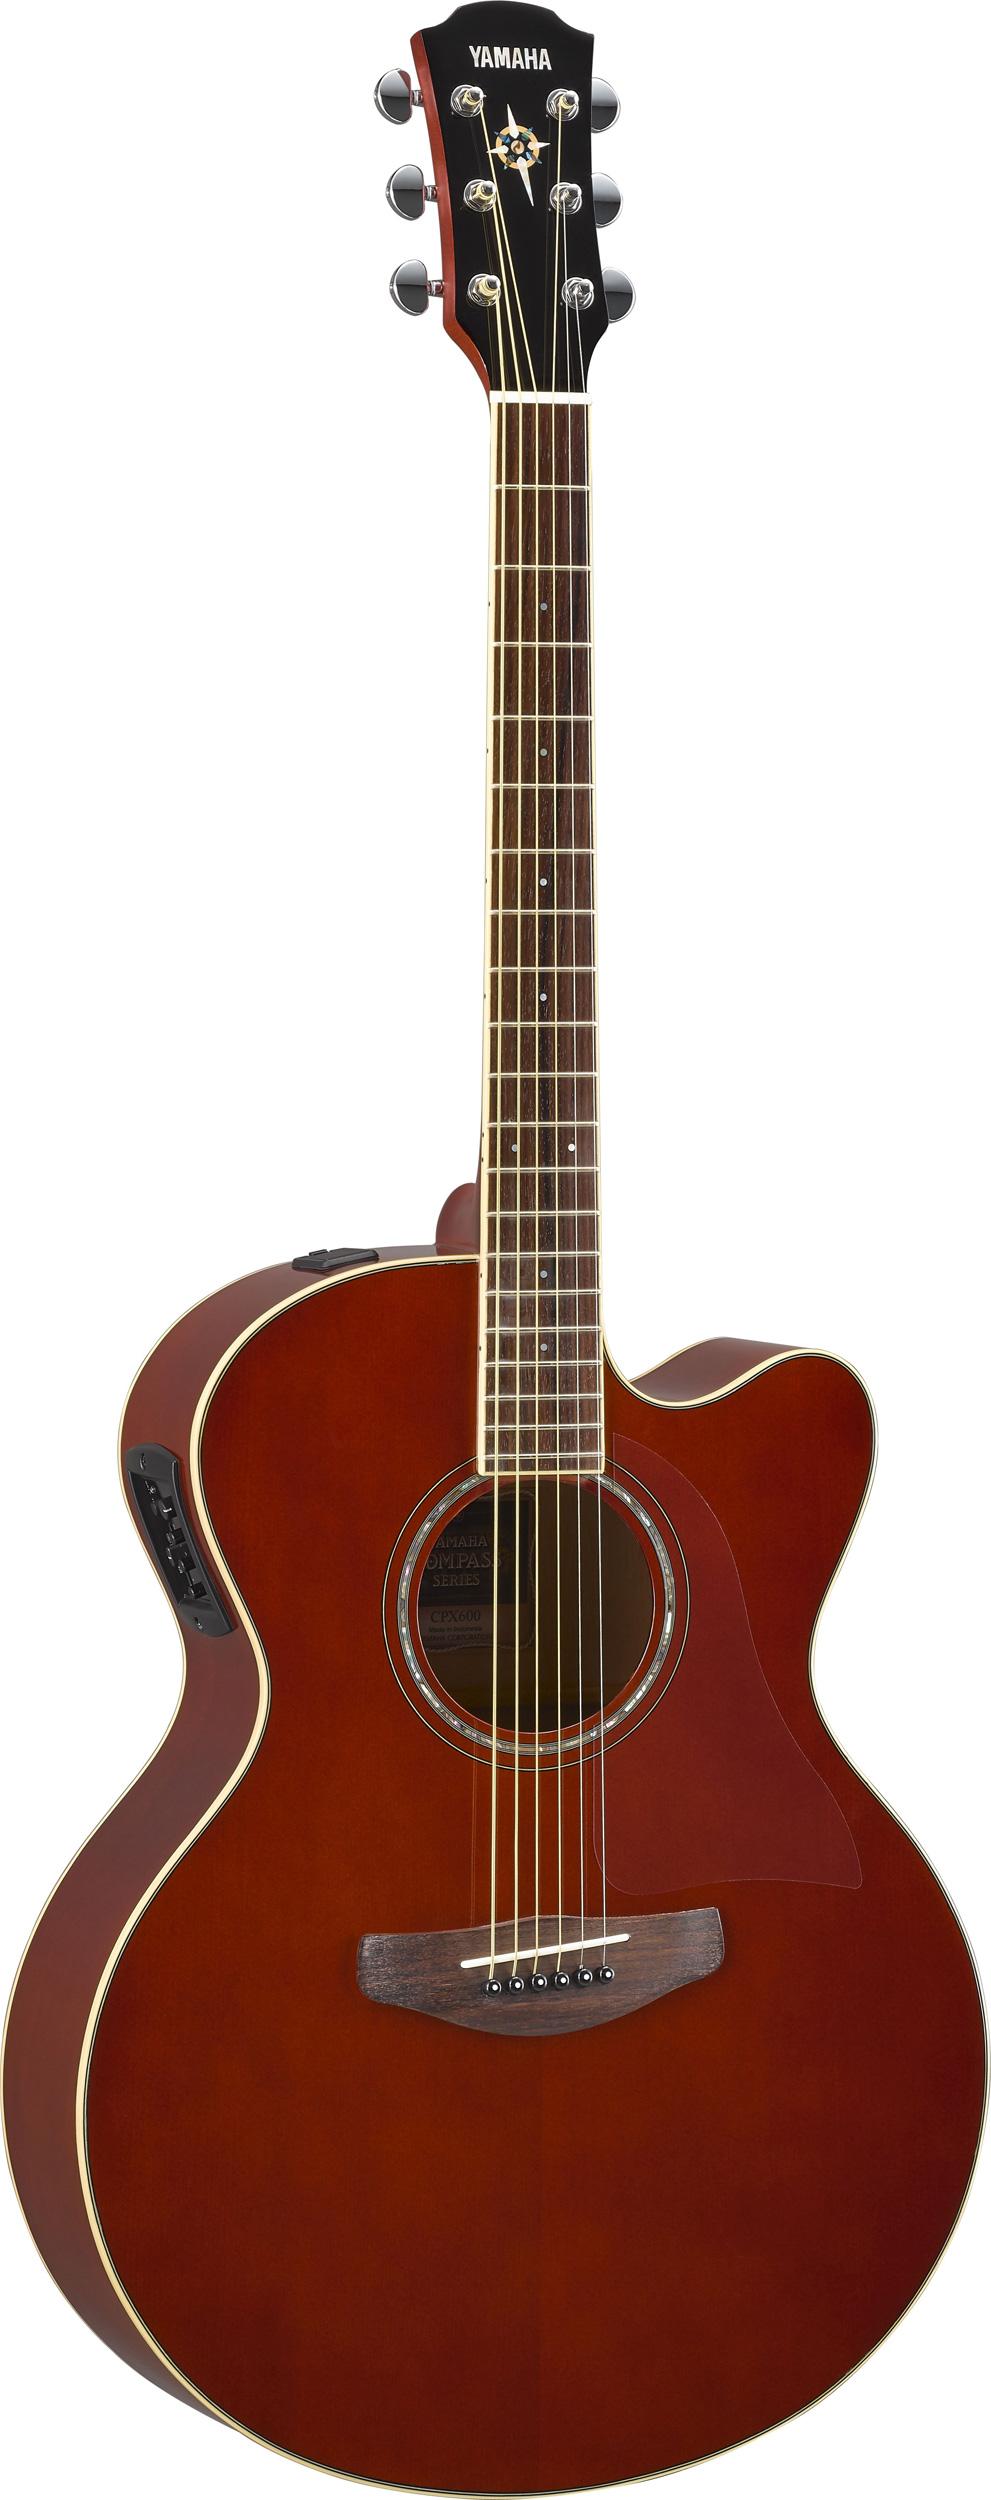 yamaha cpx600 rb compass jumbo elektro akustik gitarre. Black Bedroom Furniture Sets. Home Design Ideas